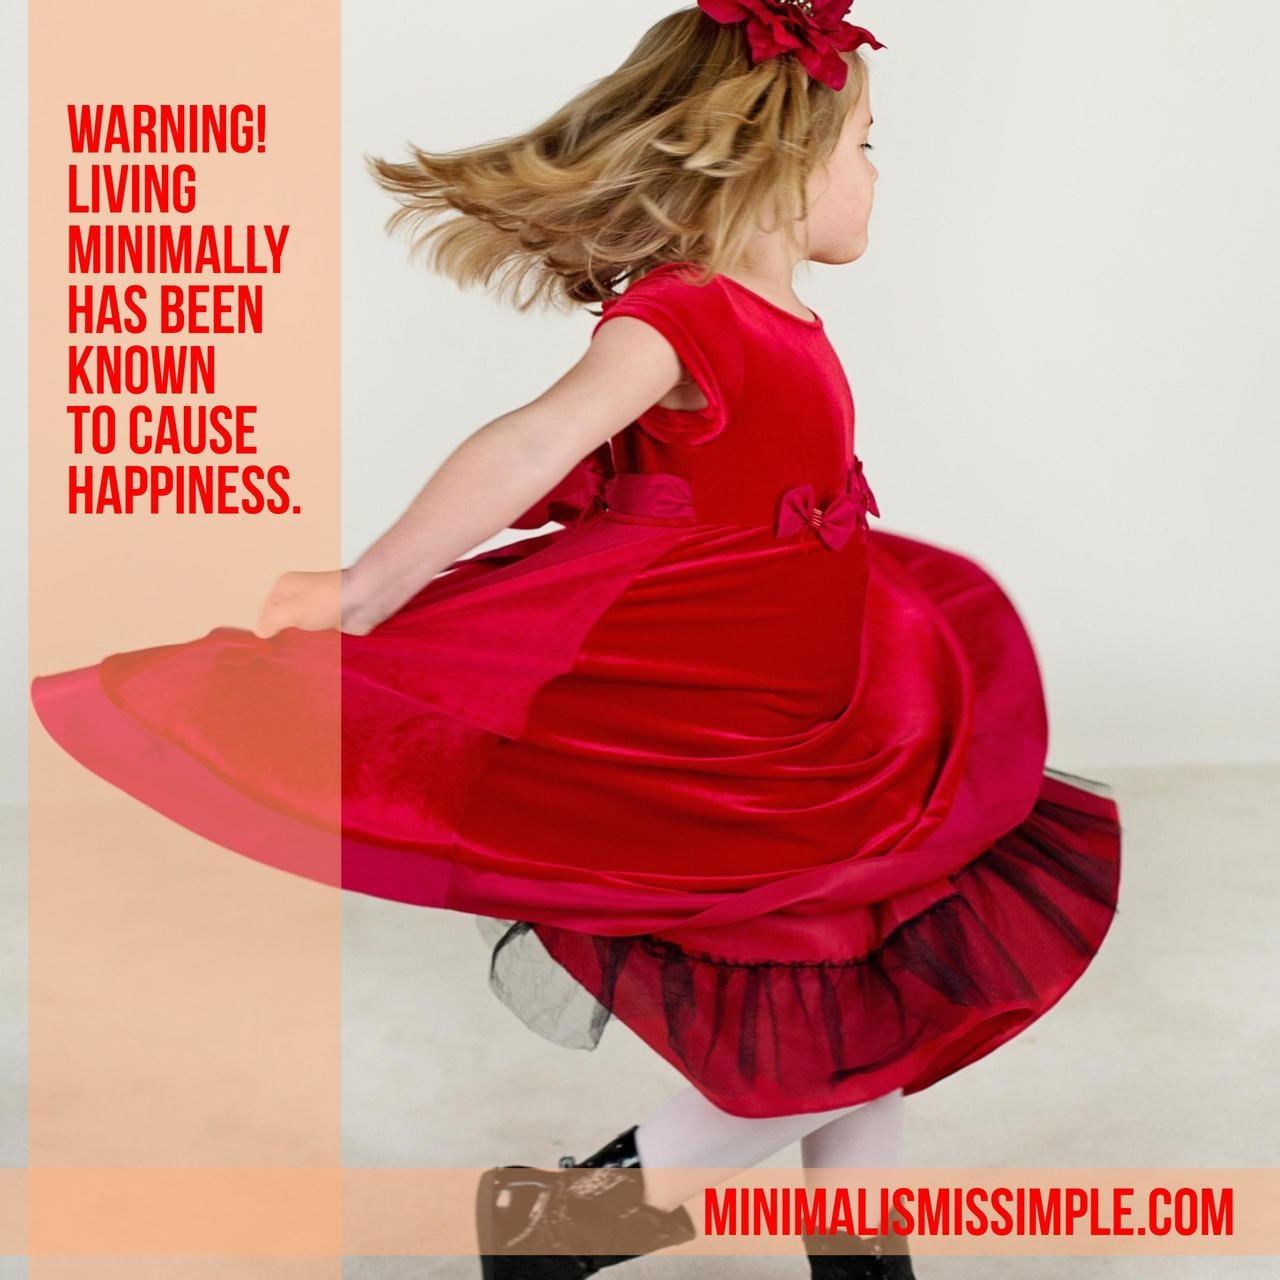 living-minimally-causes-happiness-minimalismissimple.com